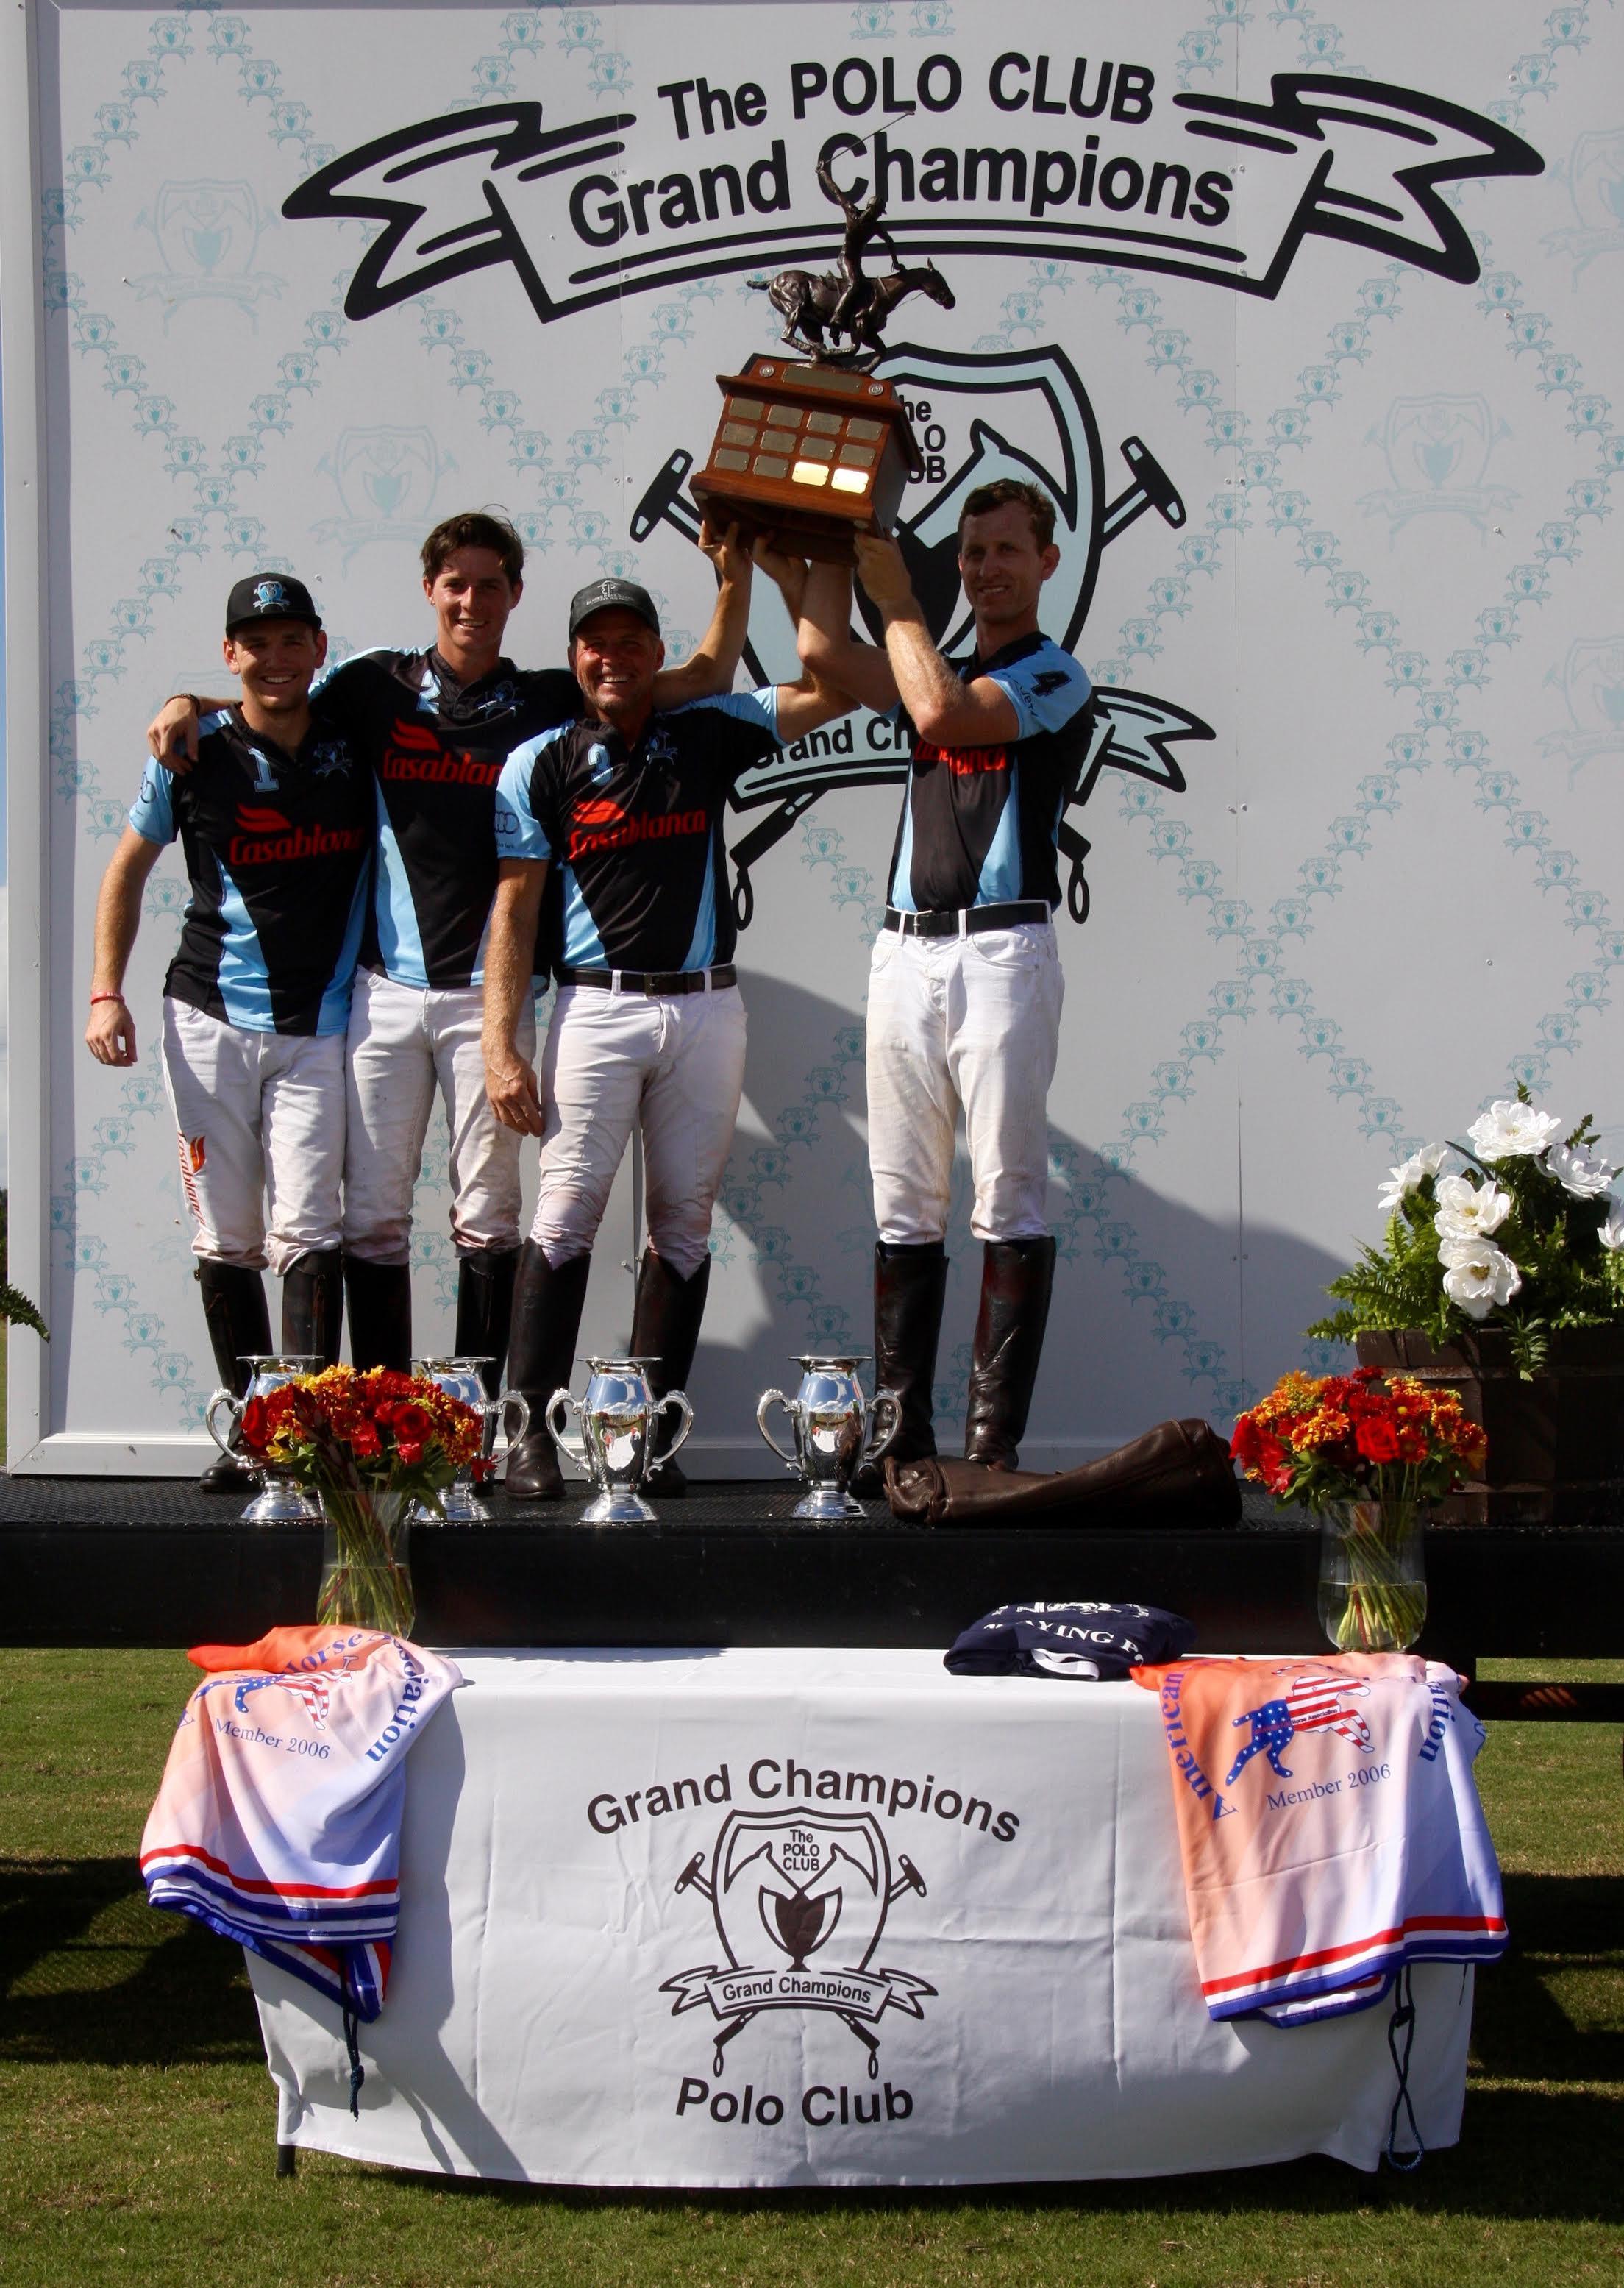 Casablanca teammates Grant Ganzi, Juancito Bollini, Mike Azzaro and Jeff Blake hoisting the coveted trophy. Photo by Sheryel Aschfort